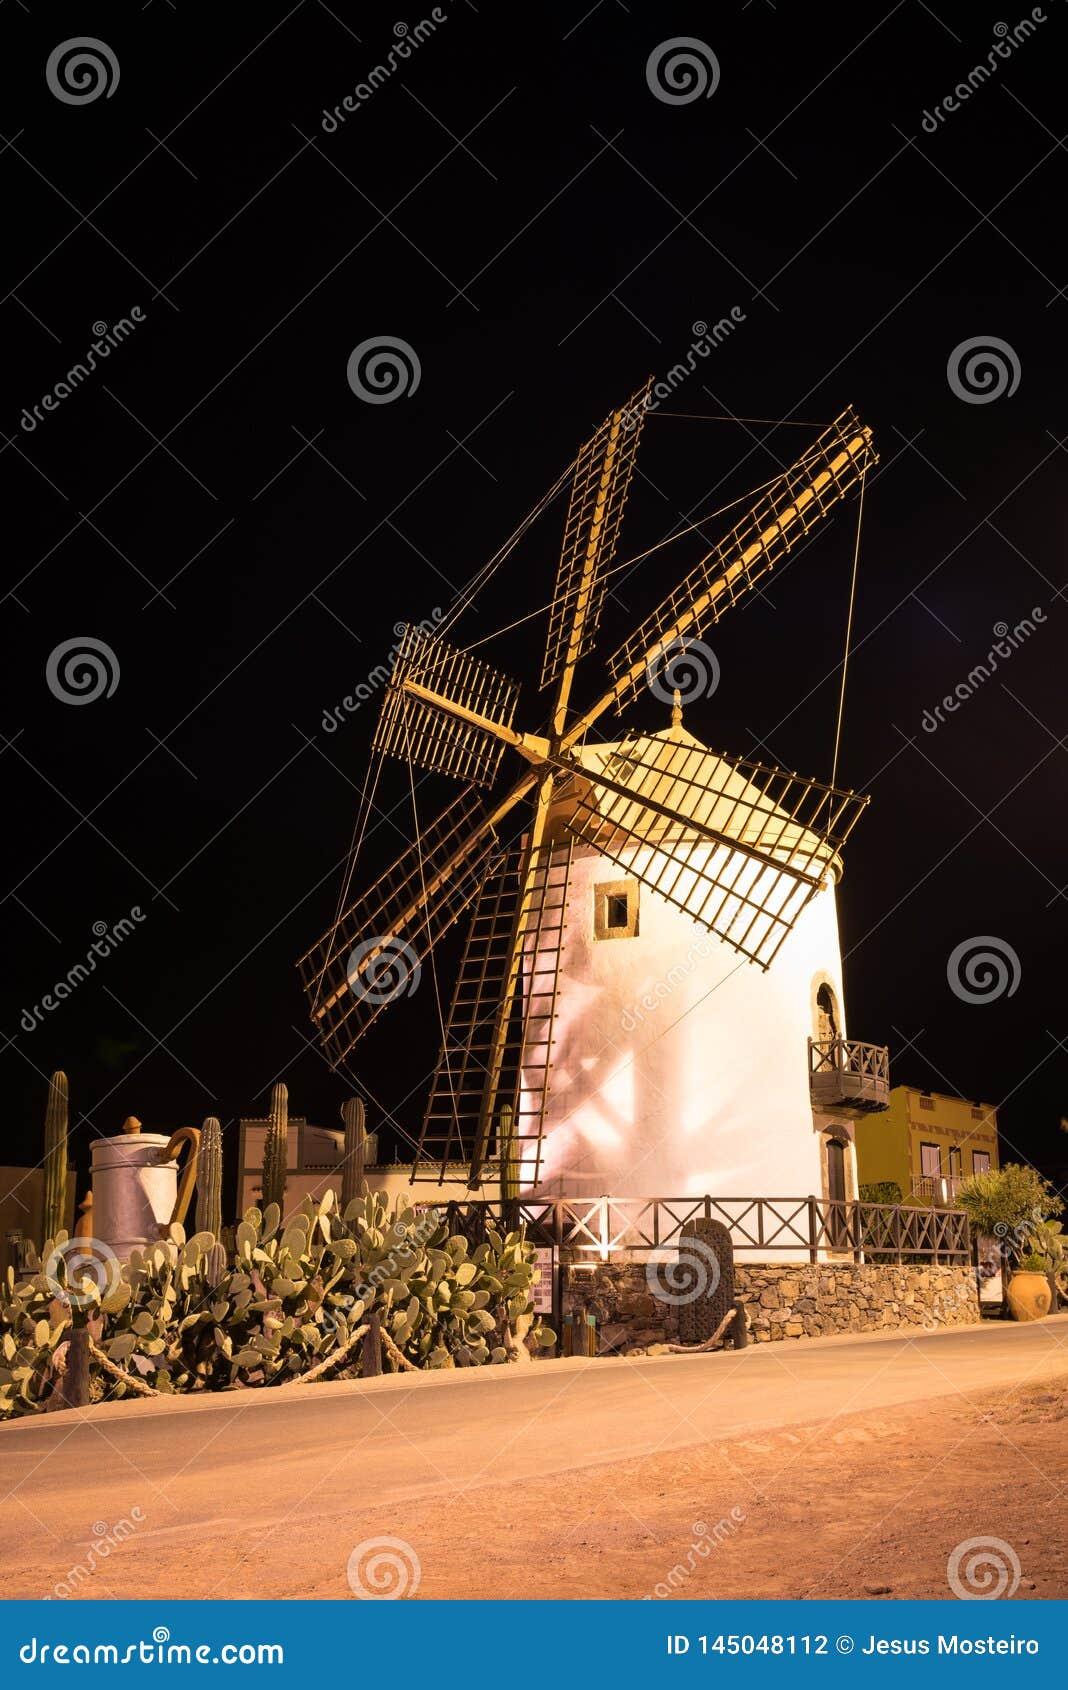 Windmill, village of Mogan in Gran Canaria, Spain